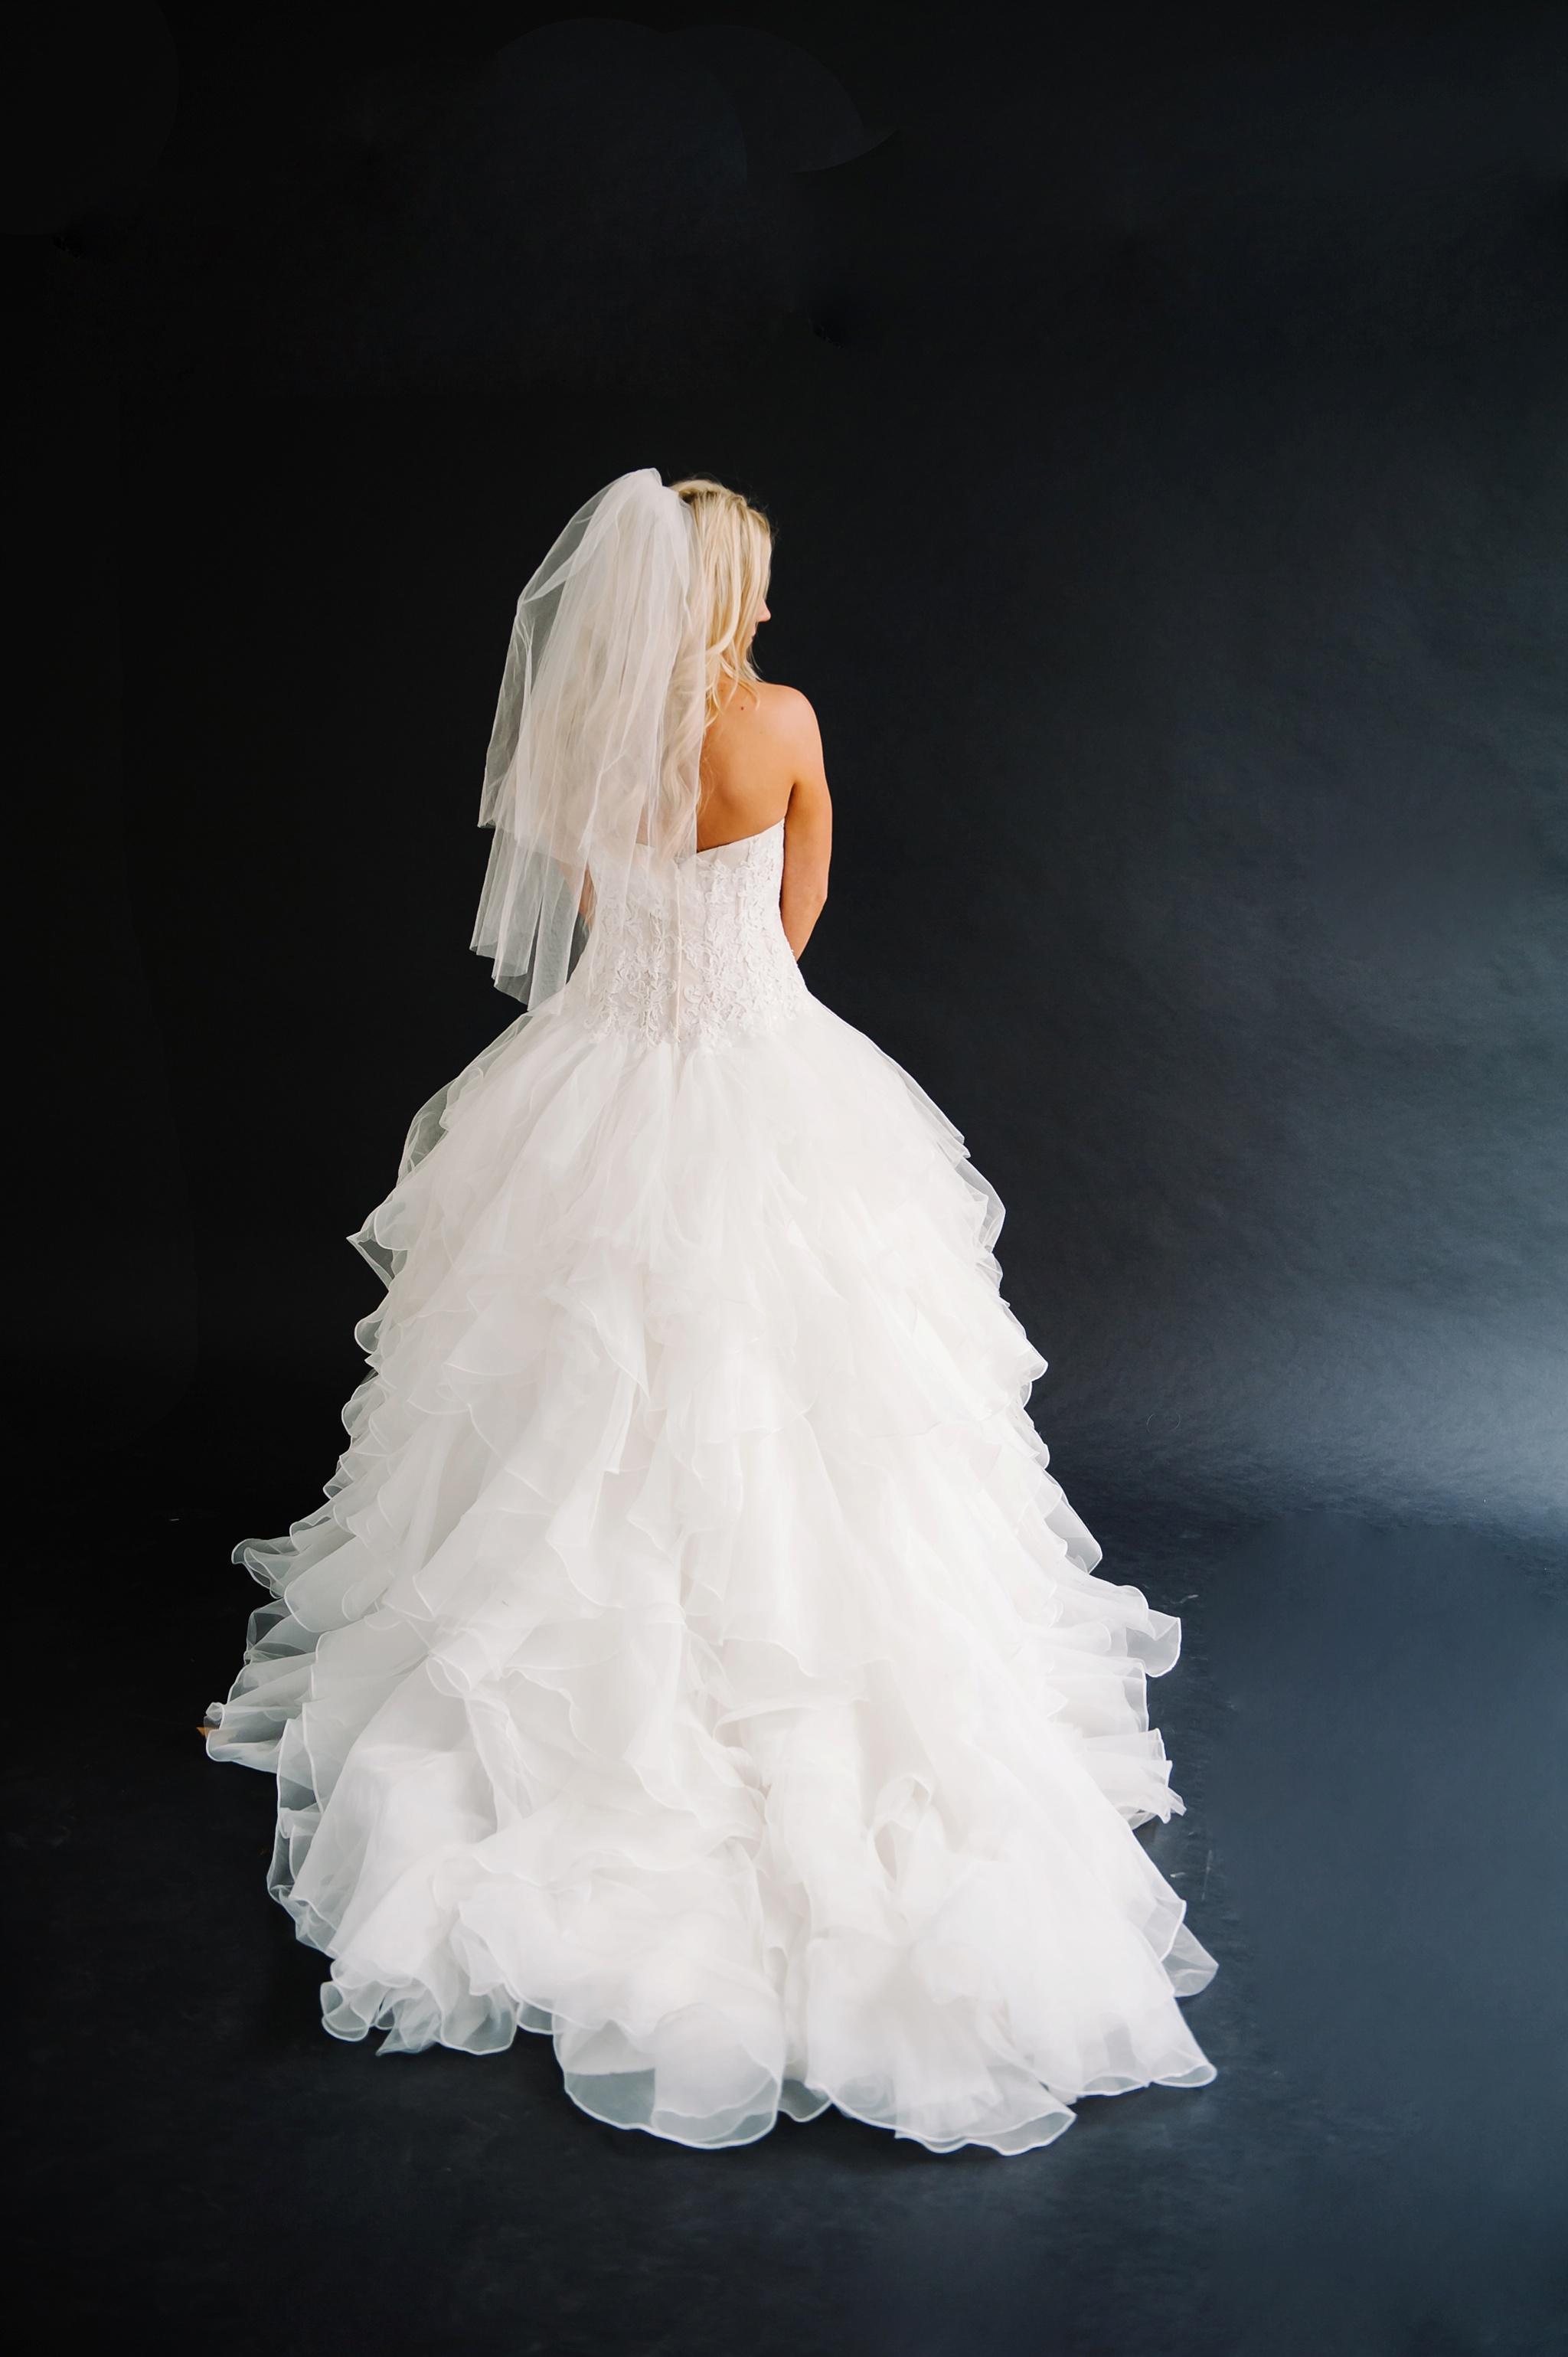 SLC Bridal Photographer Ali Sumsion 020